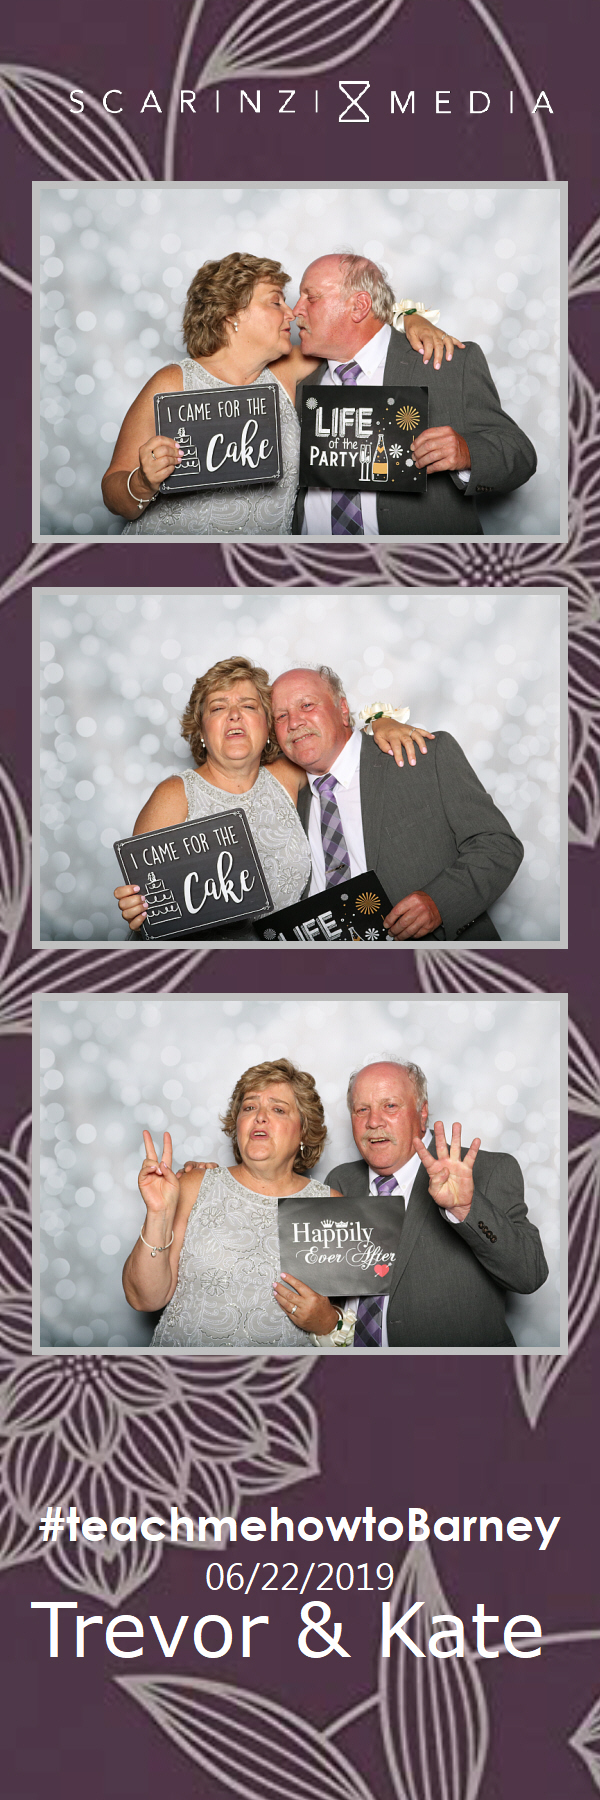 2019.06.22 - Barney Wedding PHOTOBOOTH33.jpg